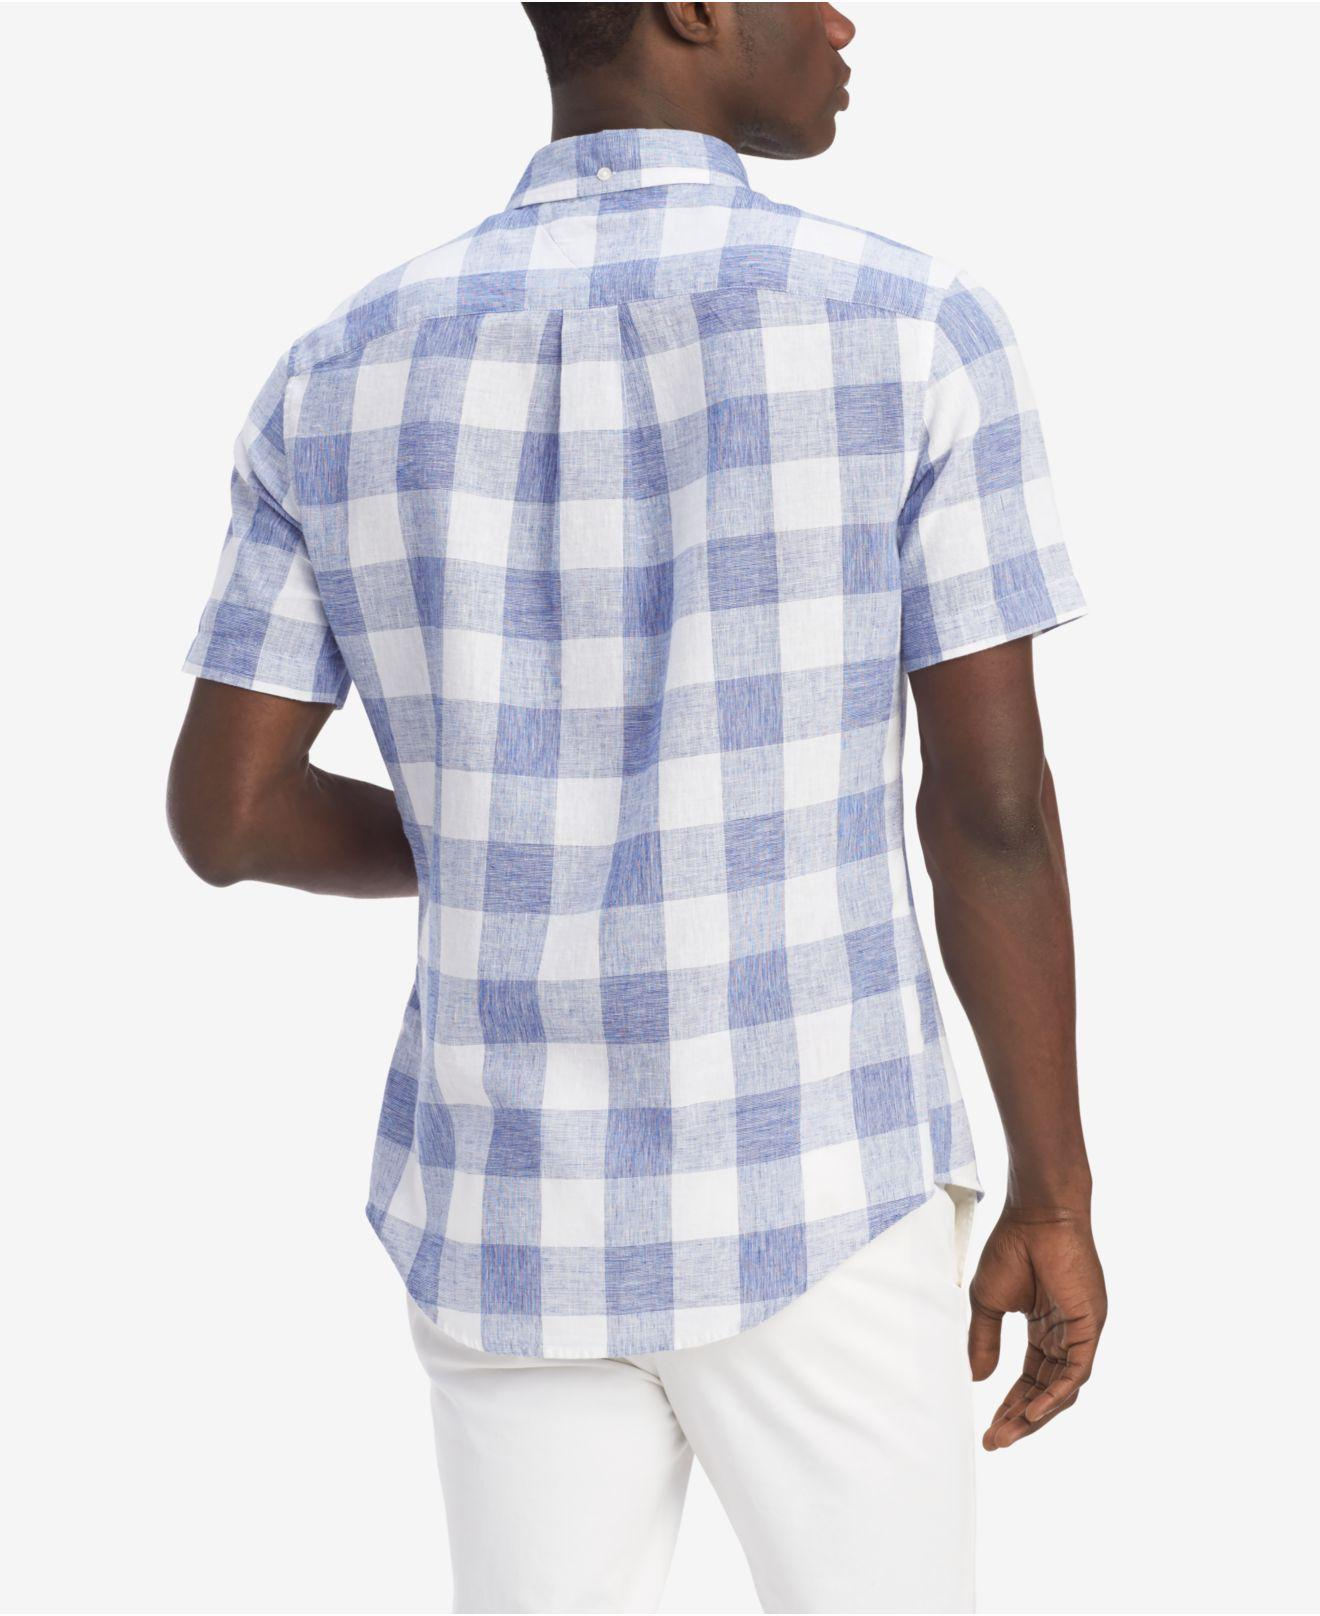 93d8207e Lyst - Tommy Hilfiger Sutter Check Shirt in Blue for Men